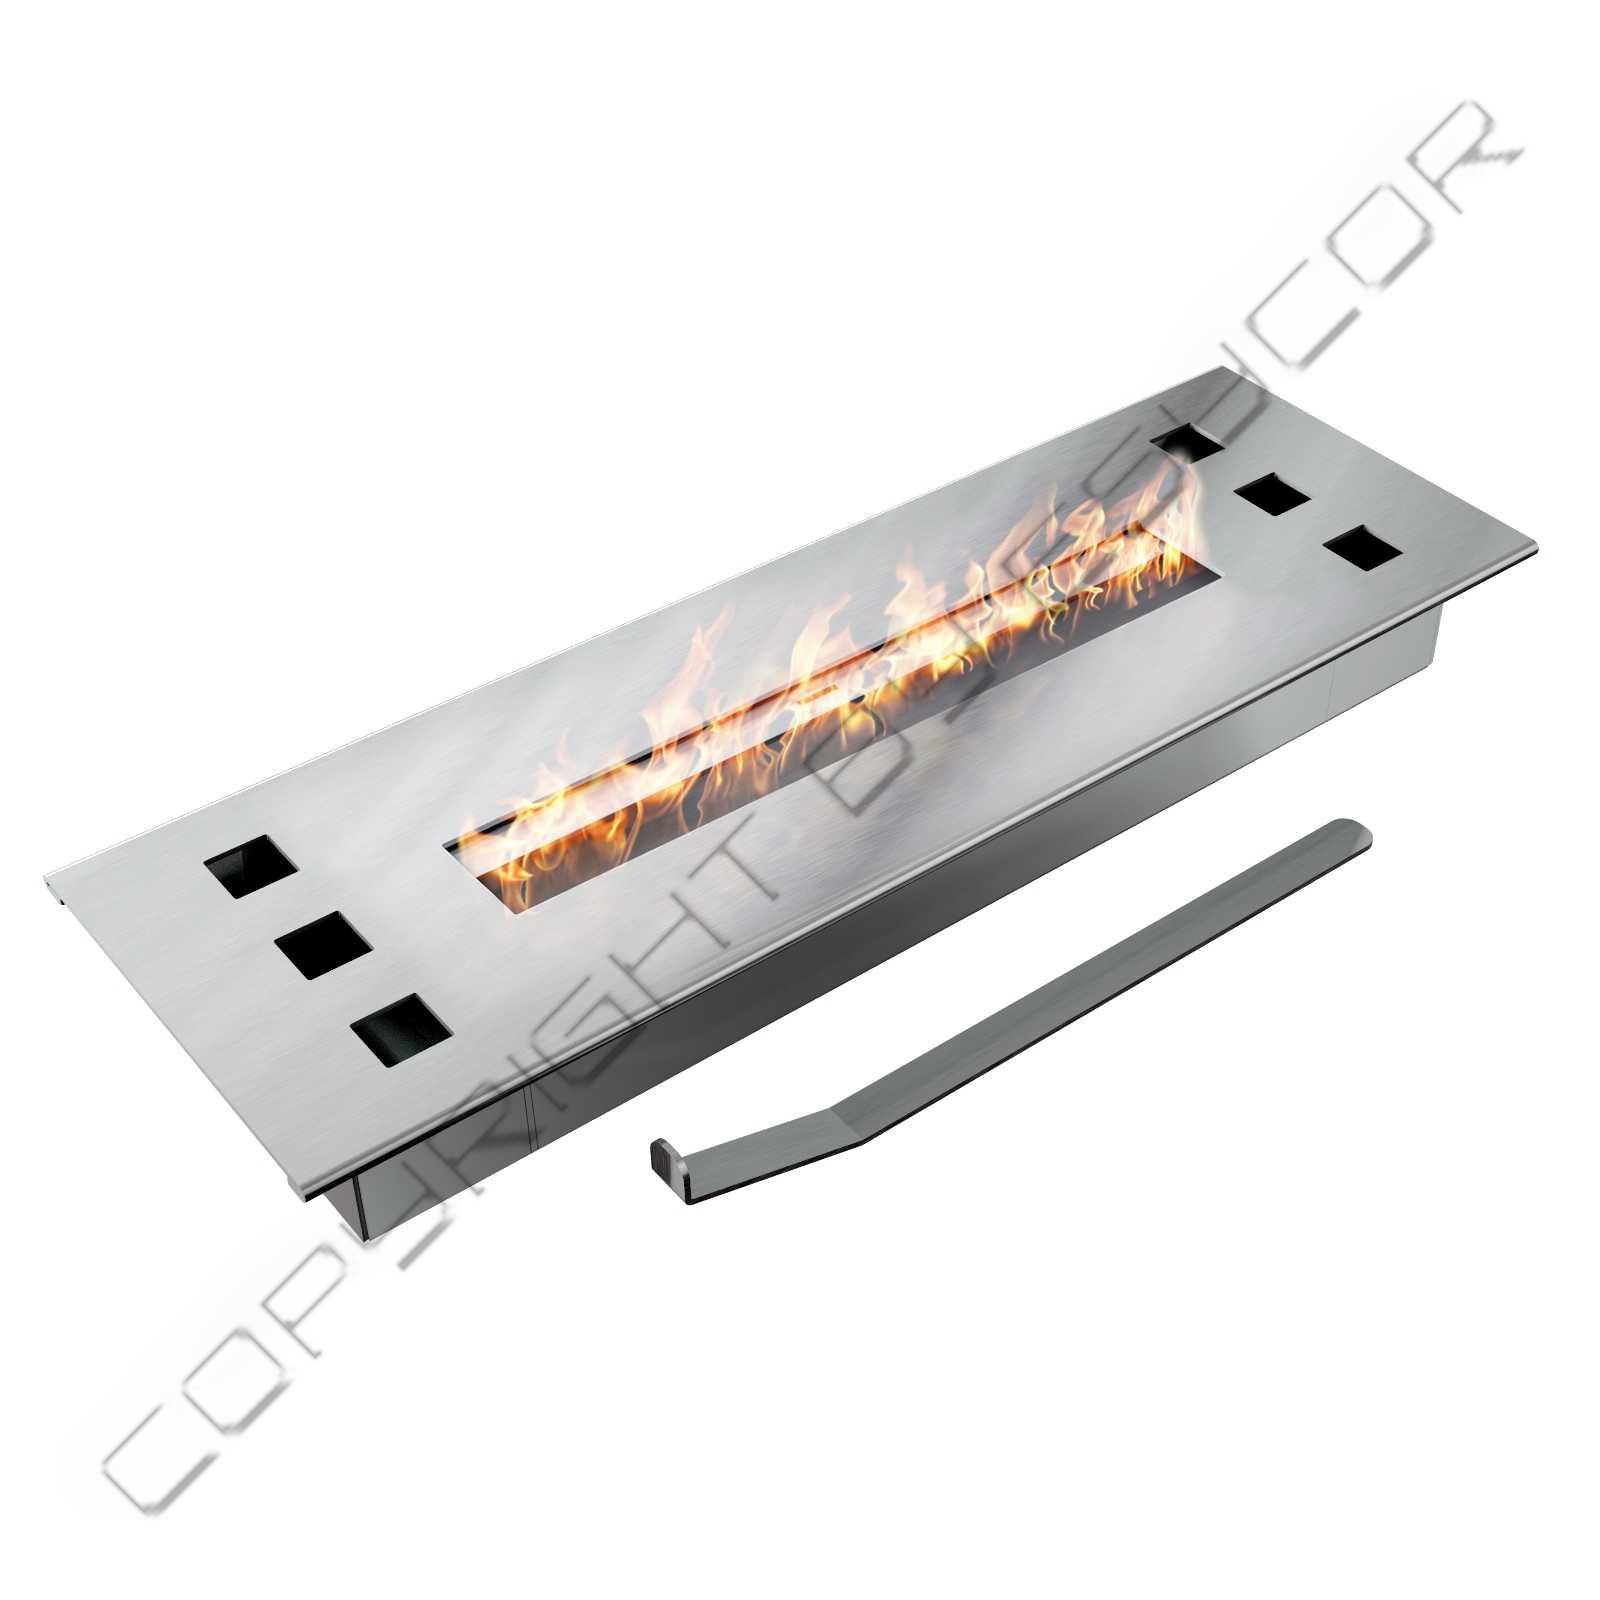 brennerbox mit aroma ltank f r ethanolkamin 1 2 liter brennboxen ethanolkamine kamine. Black Bedroom Furniture Sets. Home Design Ideas